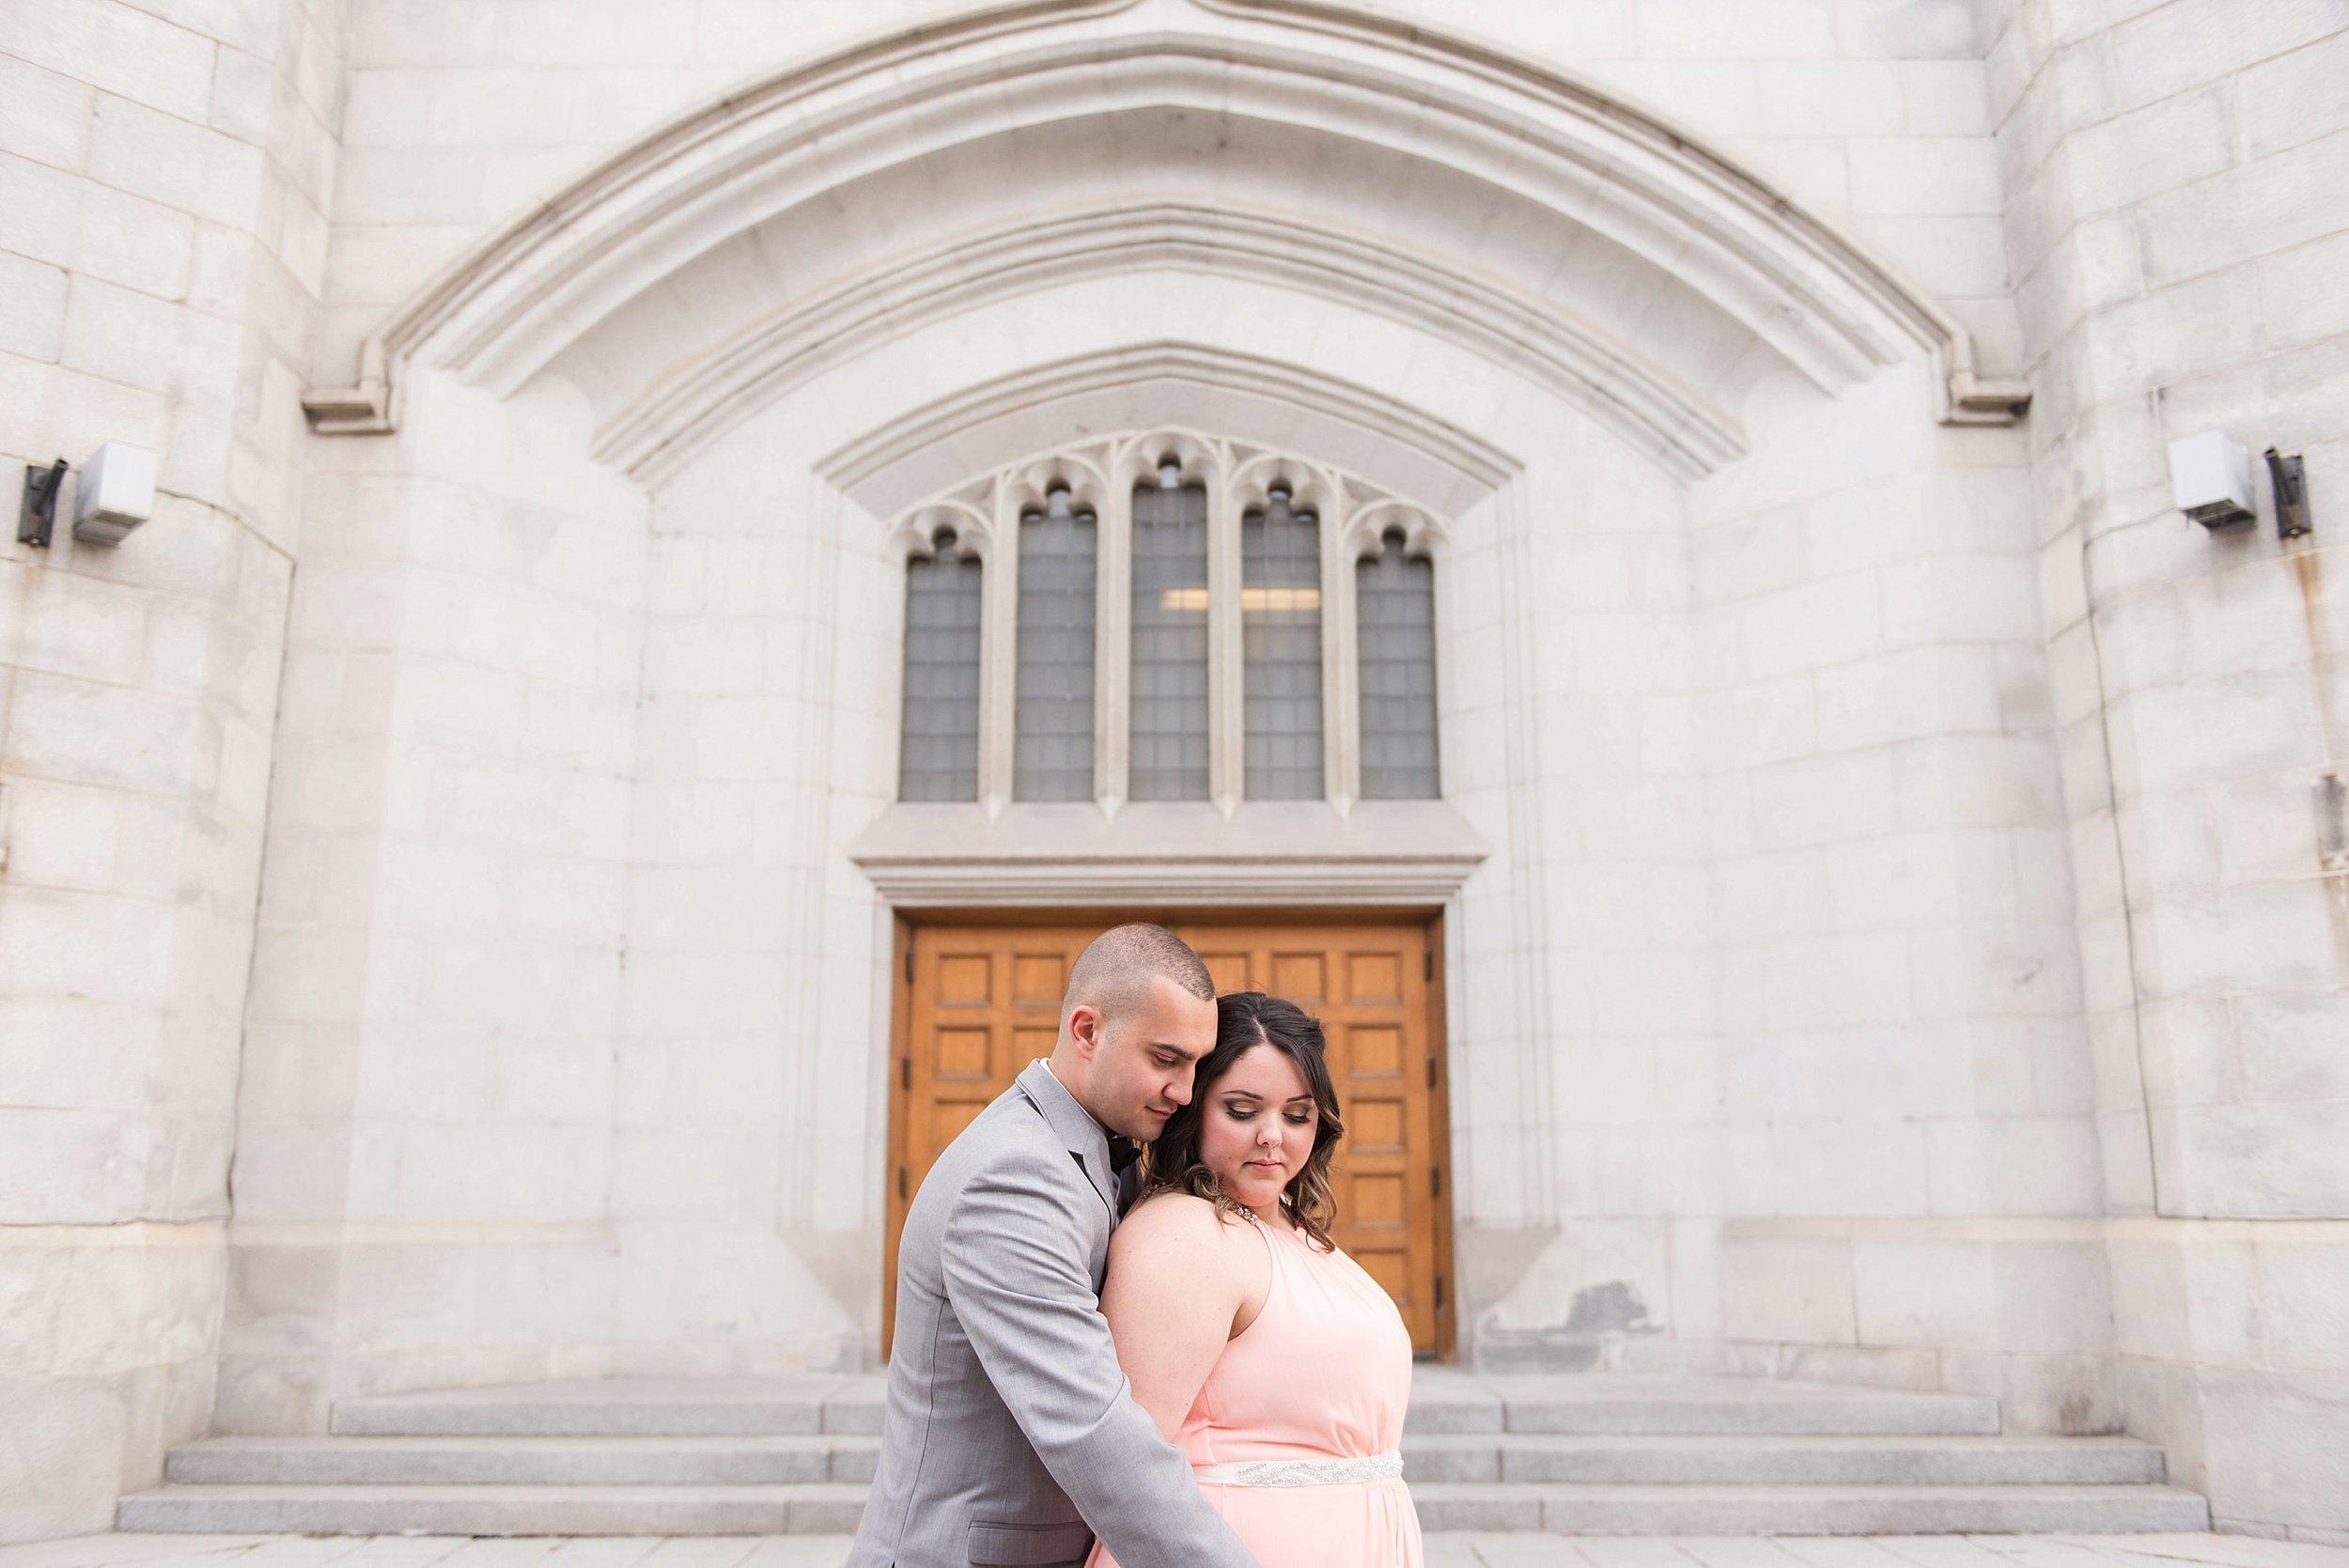 Sarmad Ashley Engagement Shoot- Ali Batoul Creatives Fine Art Wedding Photography_0080.jpg